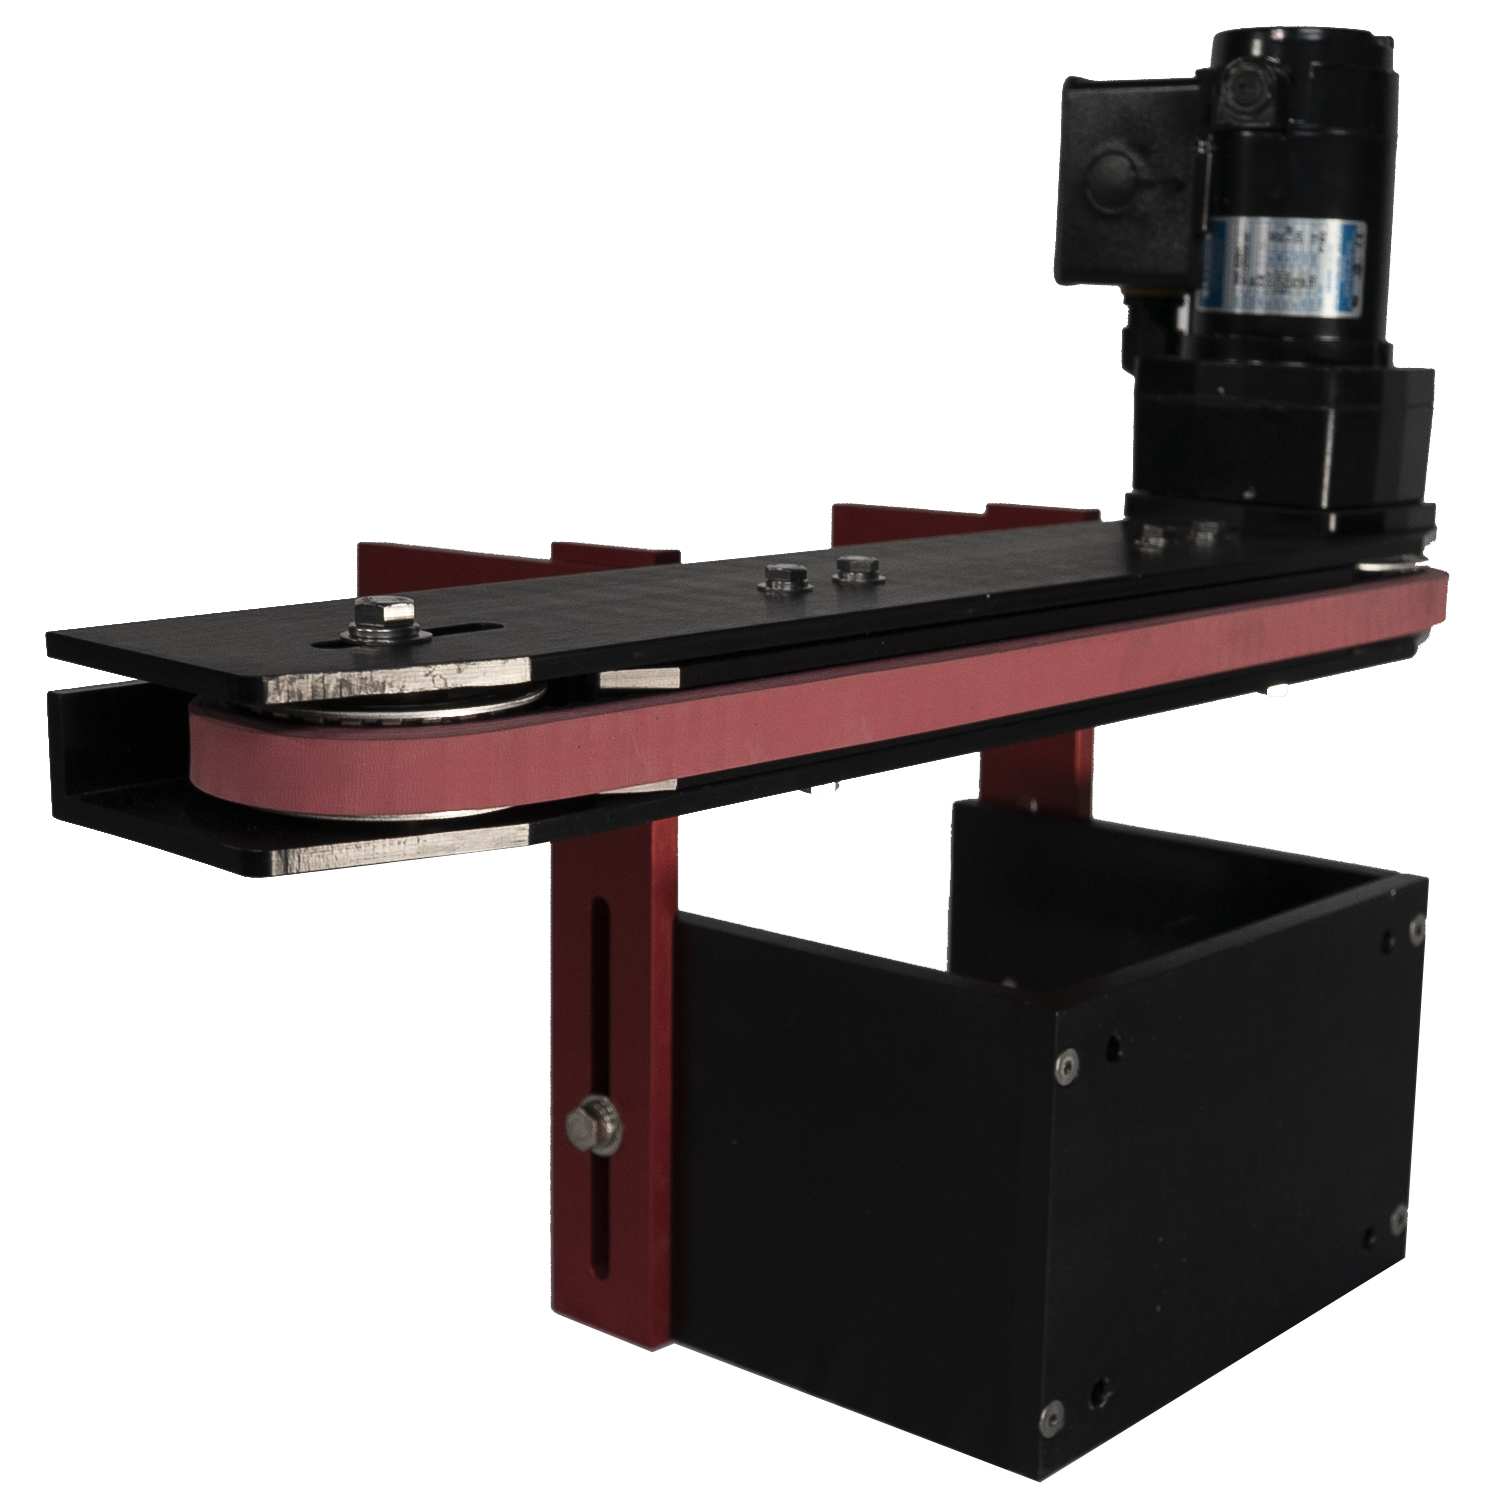 Conveyor belts - conveyance solutions